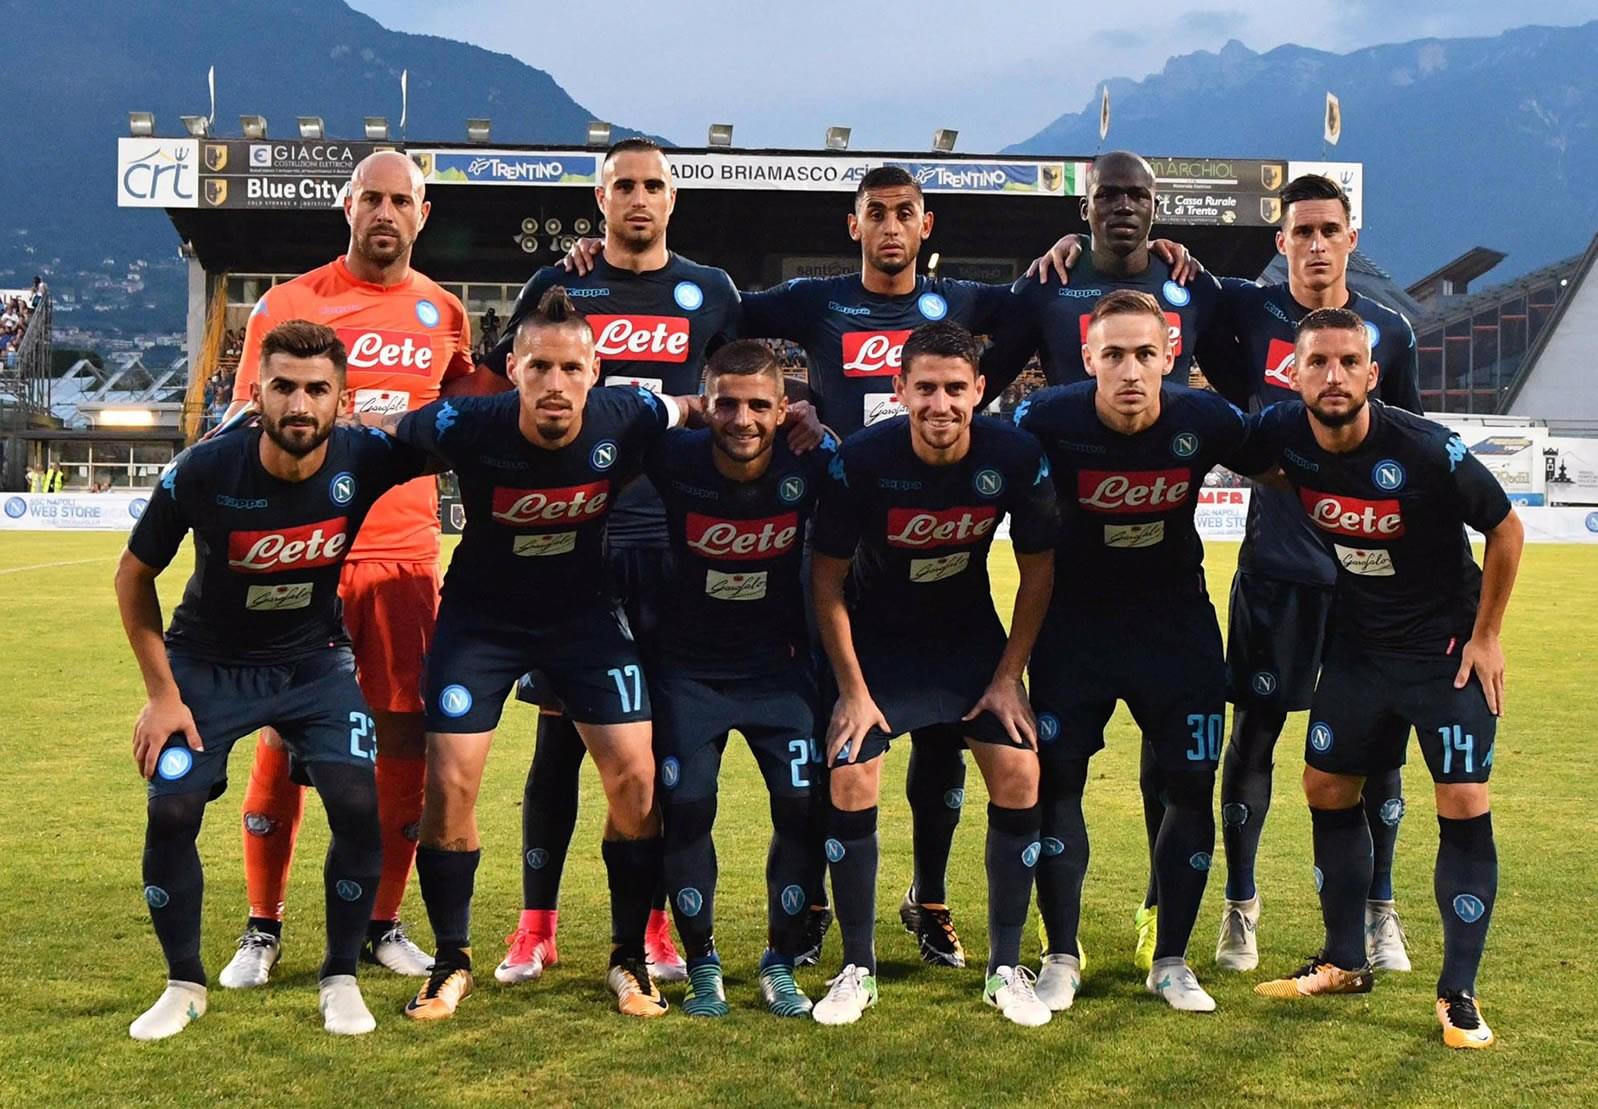 Napol estrenó la tercera camiseta ante Chievo en Trentino | Foto Twitter Oficial